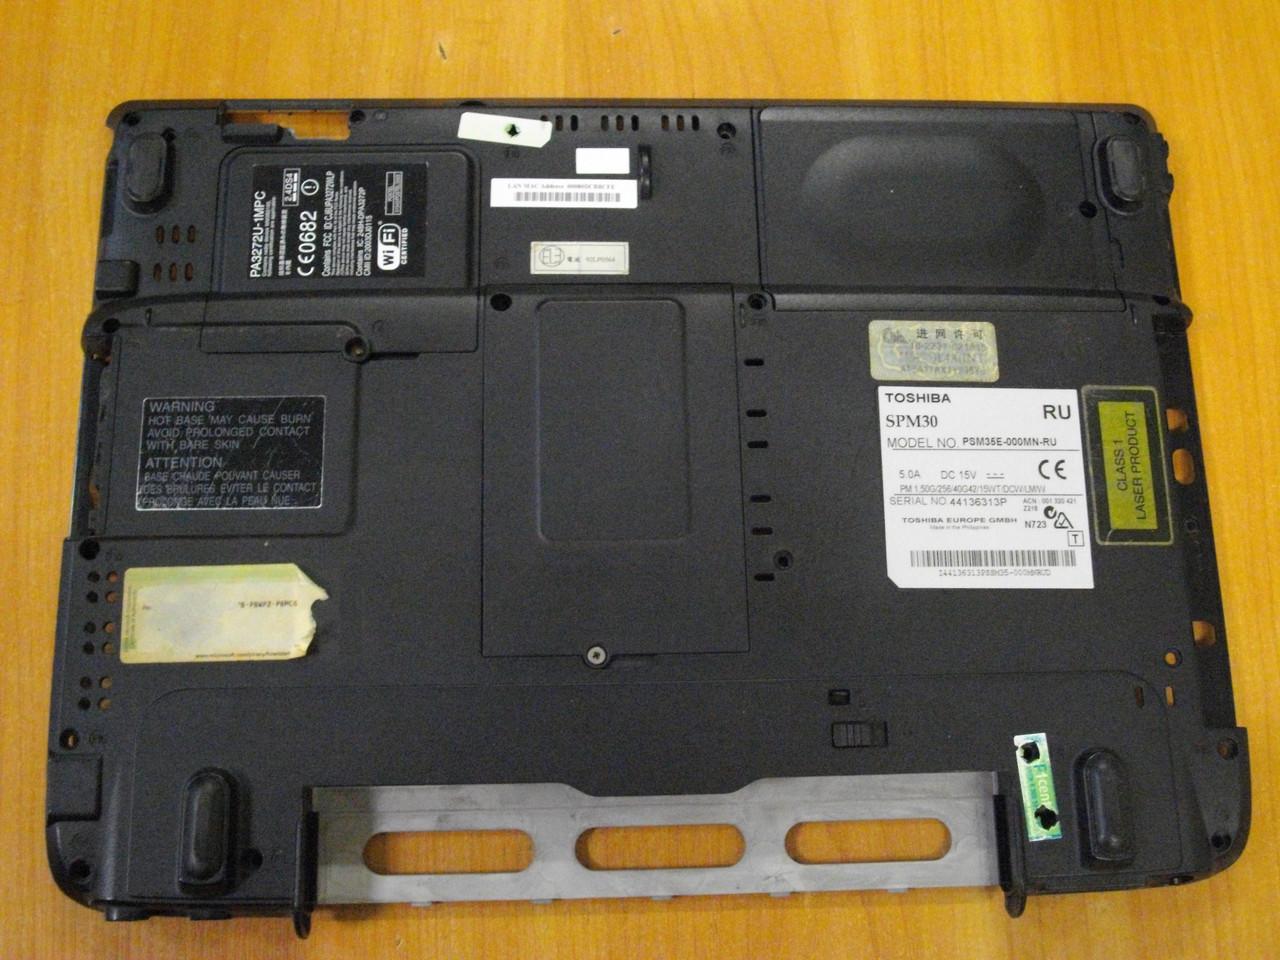 Низ. Нижняя часть корпуса. Корпус Toshiba SPM30 PSM35E M30 M35 PSM35E-000MN-RU бу